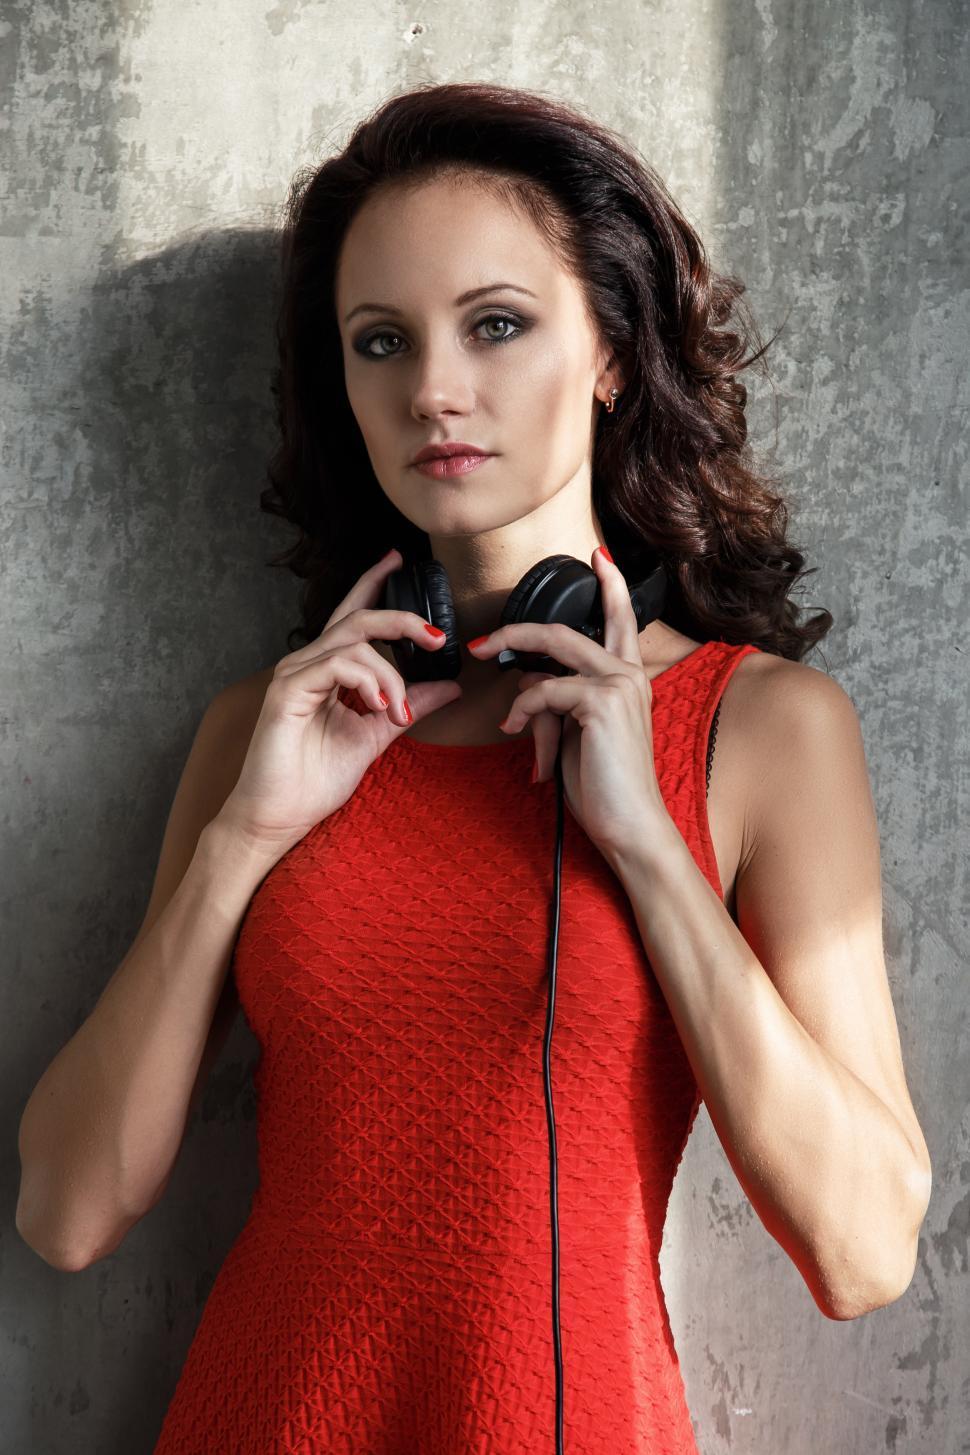 Download Free Stock HD Photo of Dj, music. Attractive girl with headphones Online